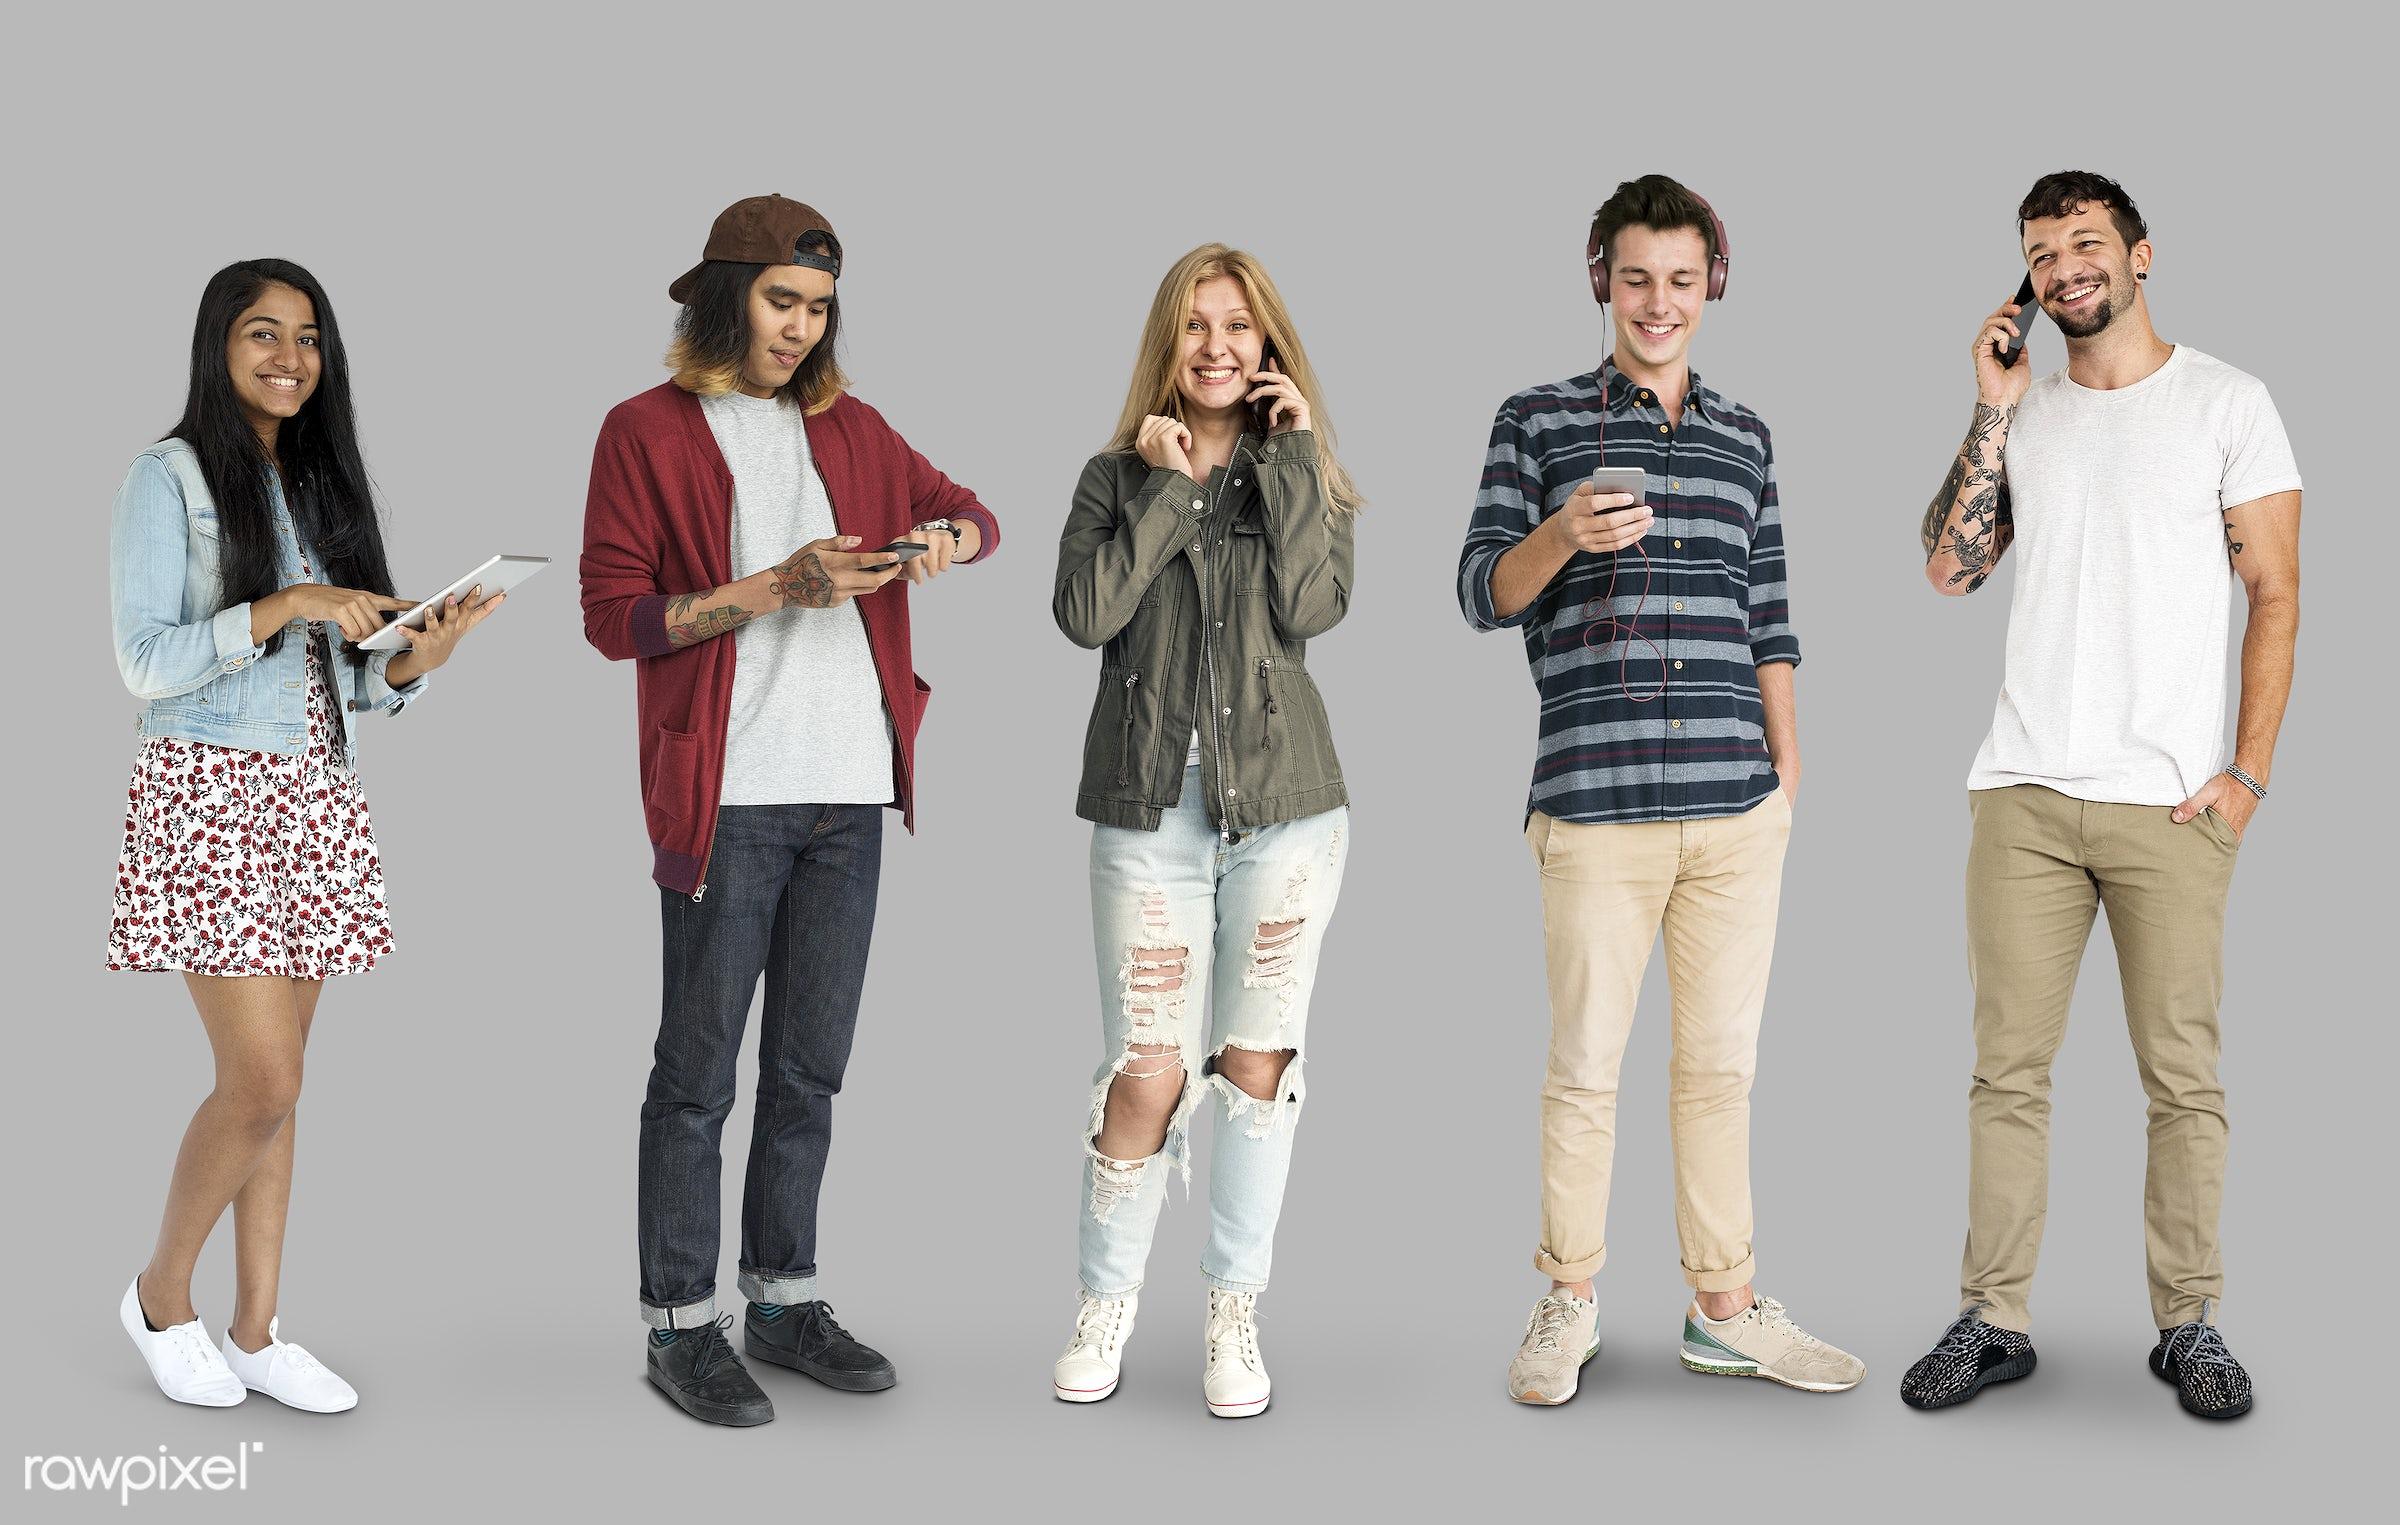 using, full length, diverse, people, race, caucasian, asian, woman, social, lifestyle, studio squareset, smart phone,...